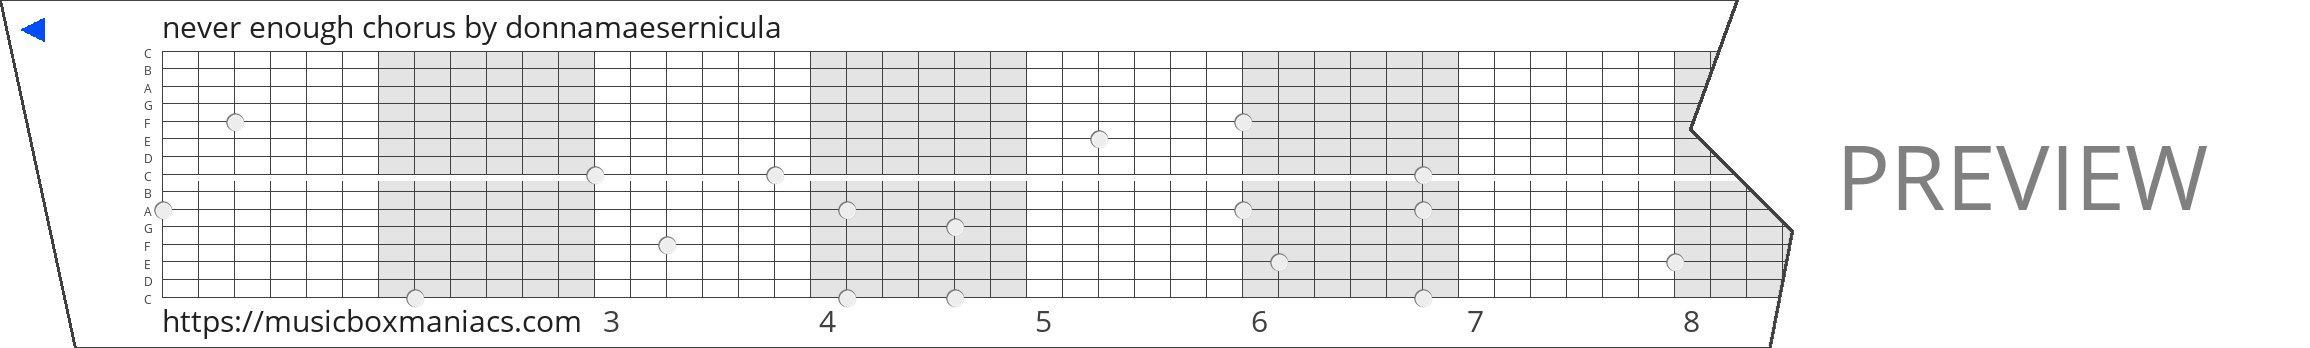 never enough chorus 15 note music box paper strip